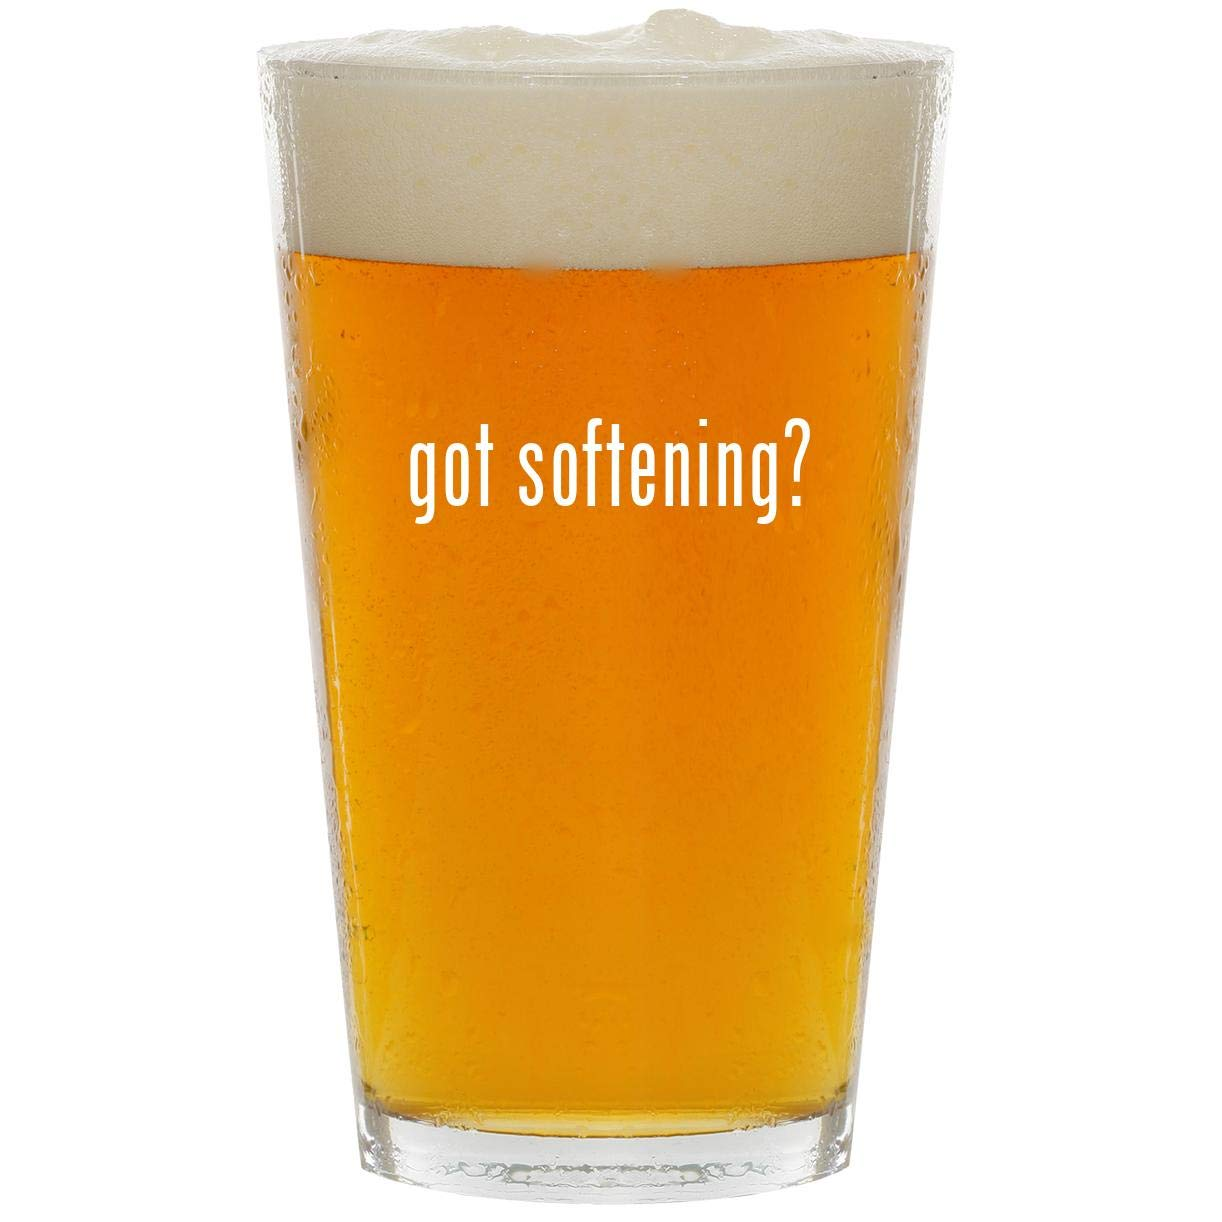 got softening? - Glass 16oz Beer Pint